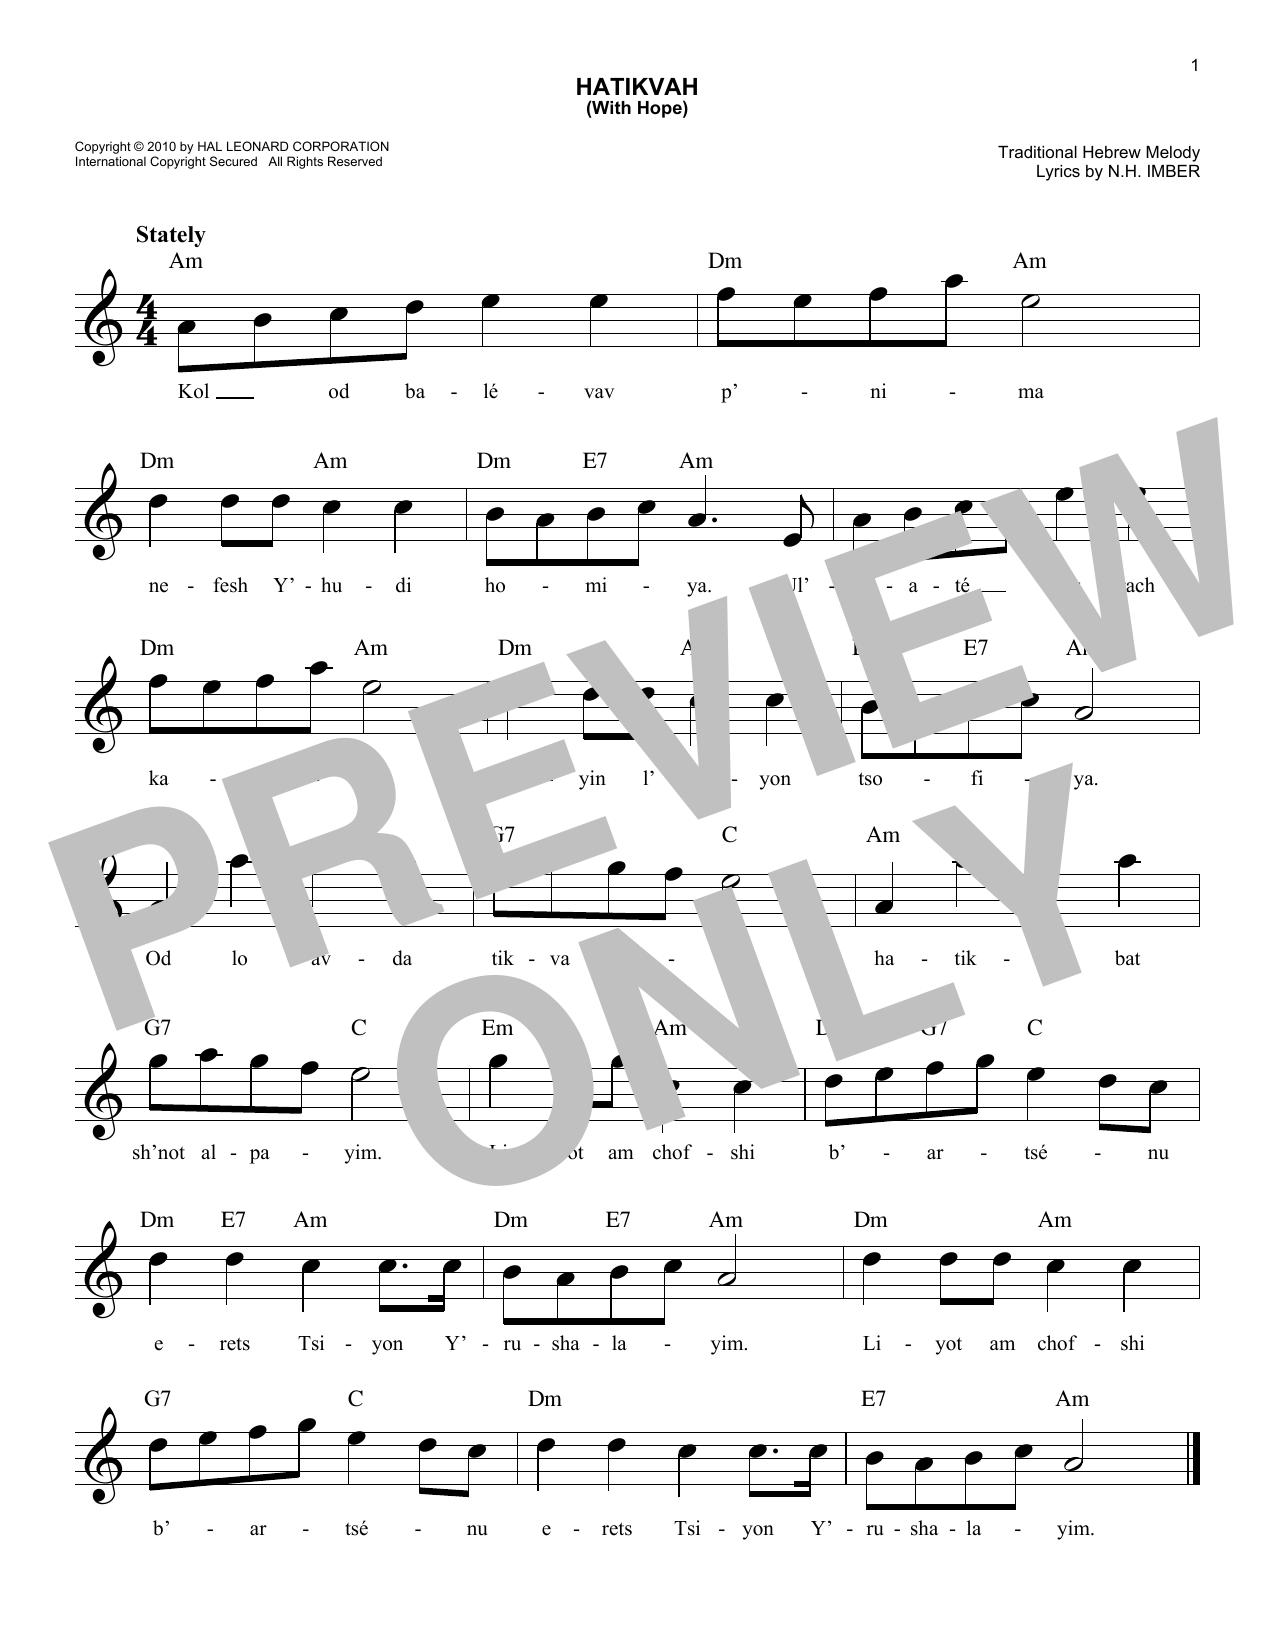 HaTikvah (With Hope) Sheet Music